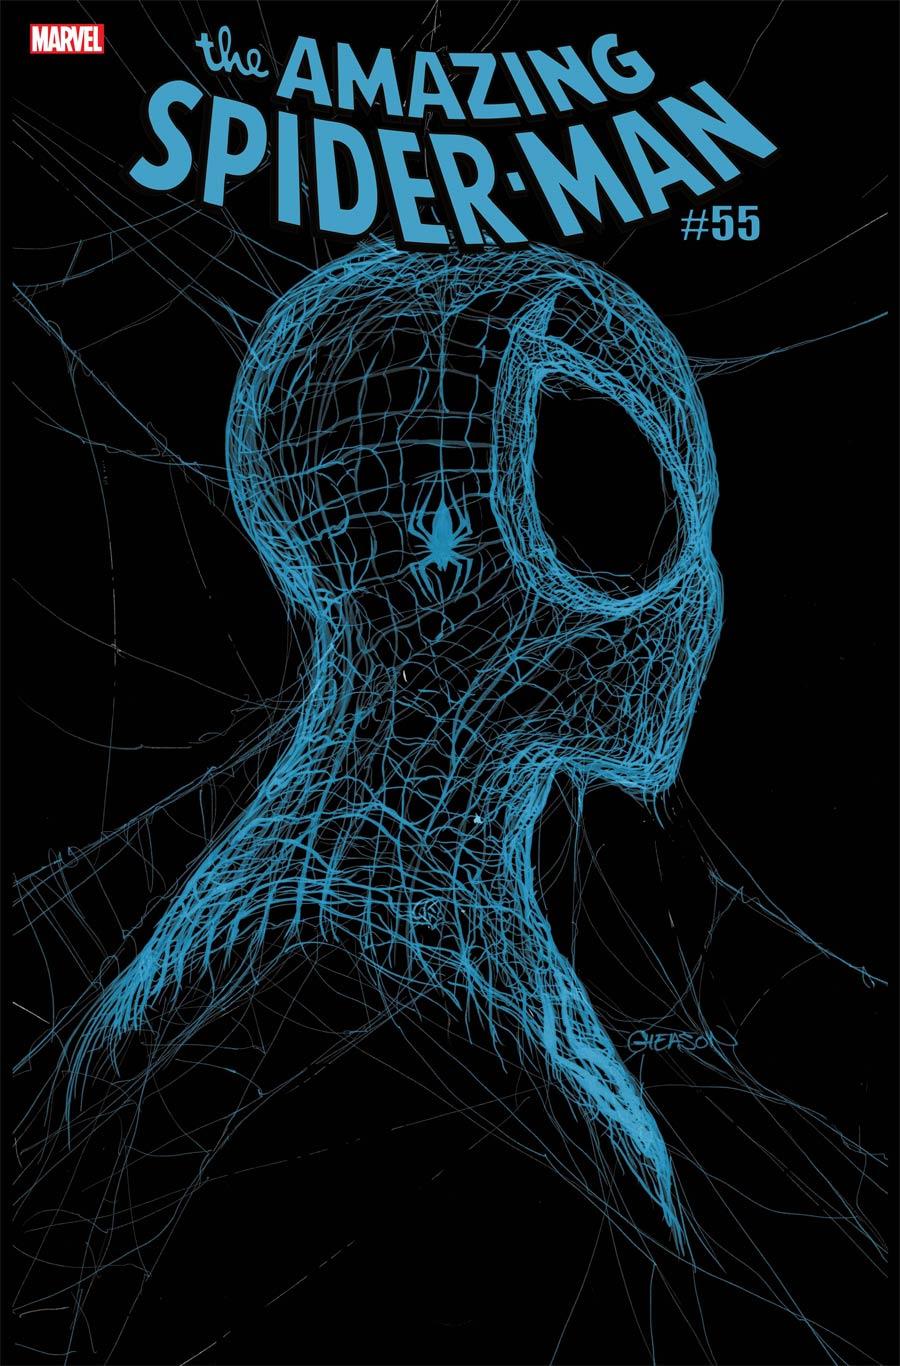 Amazing Spider-Man Vol 5 #55 Cover I 3rd Ptg Patrick Gleason Webhead Blue On Black Variant Cover